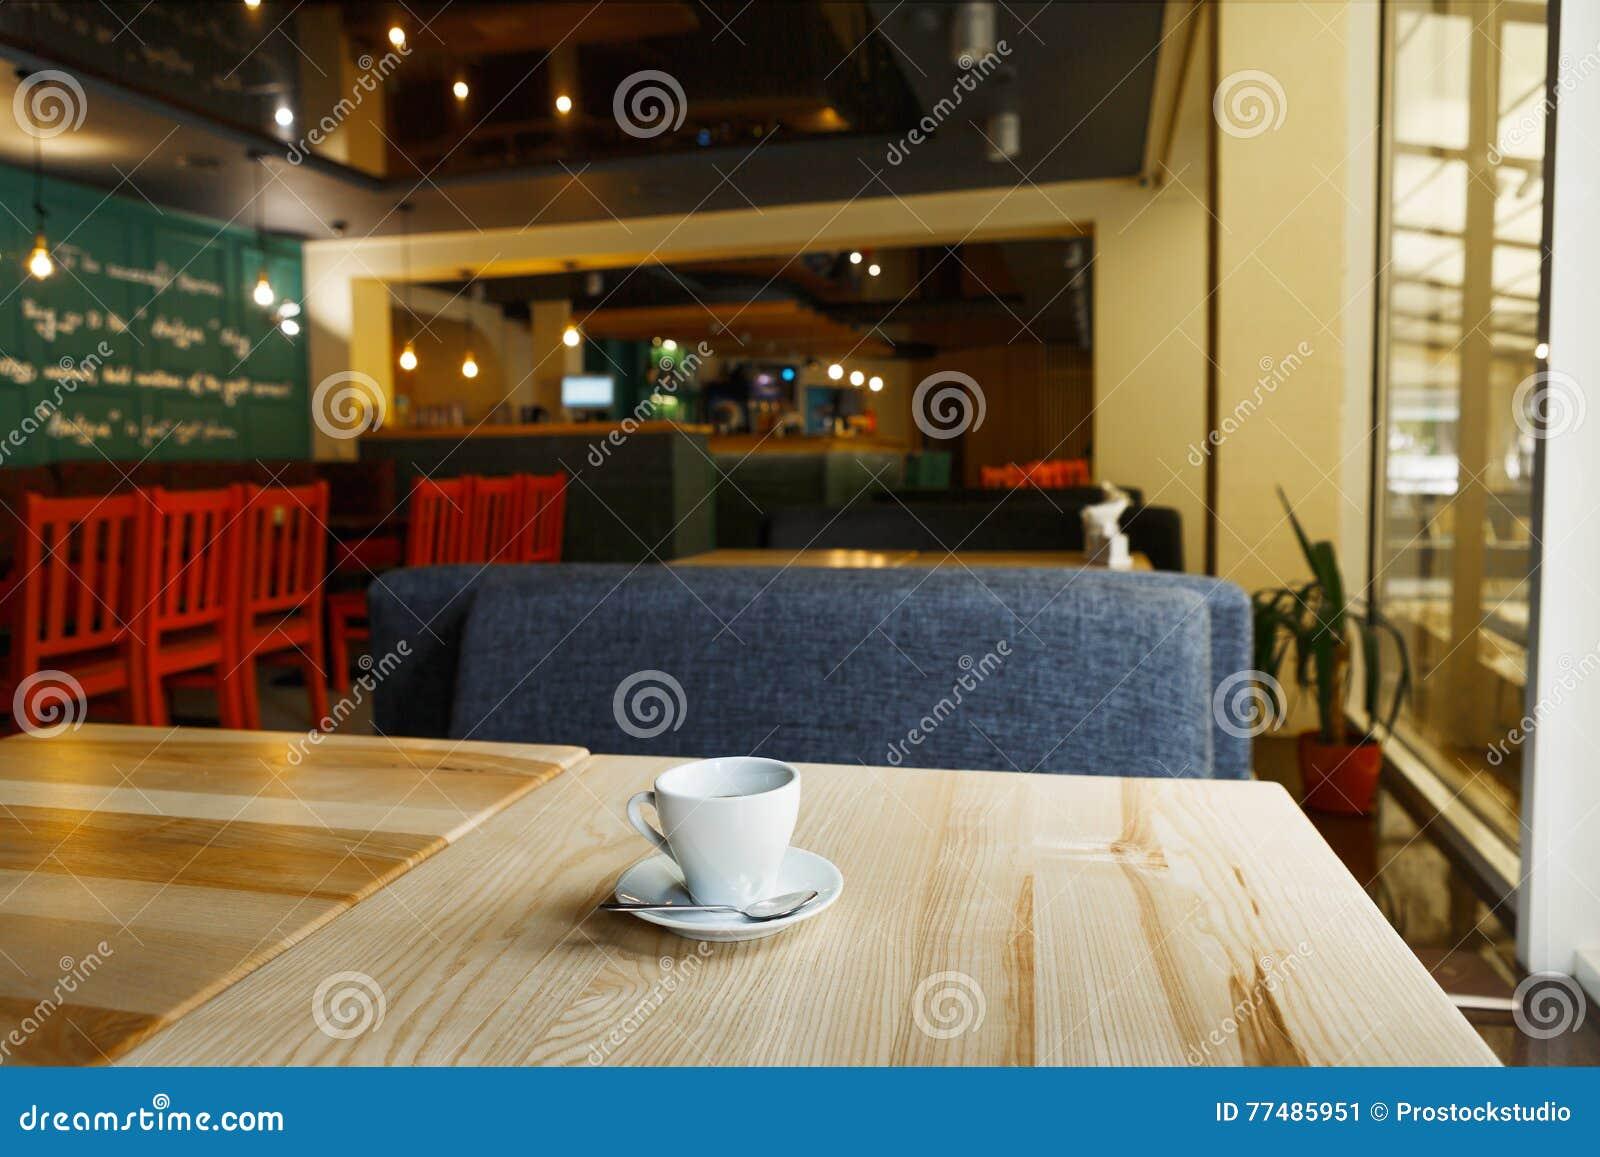 Modern Restaurant Bar Or Cafe Interior Stock Image Image Of Morning Modern 77485951